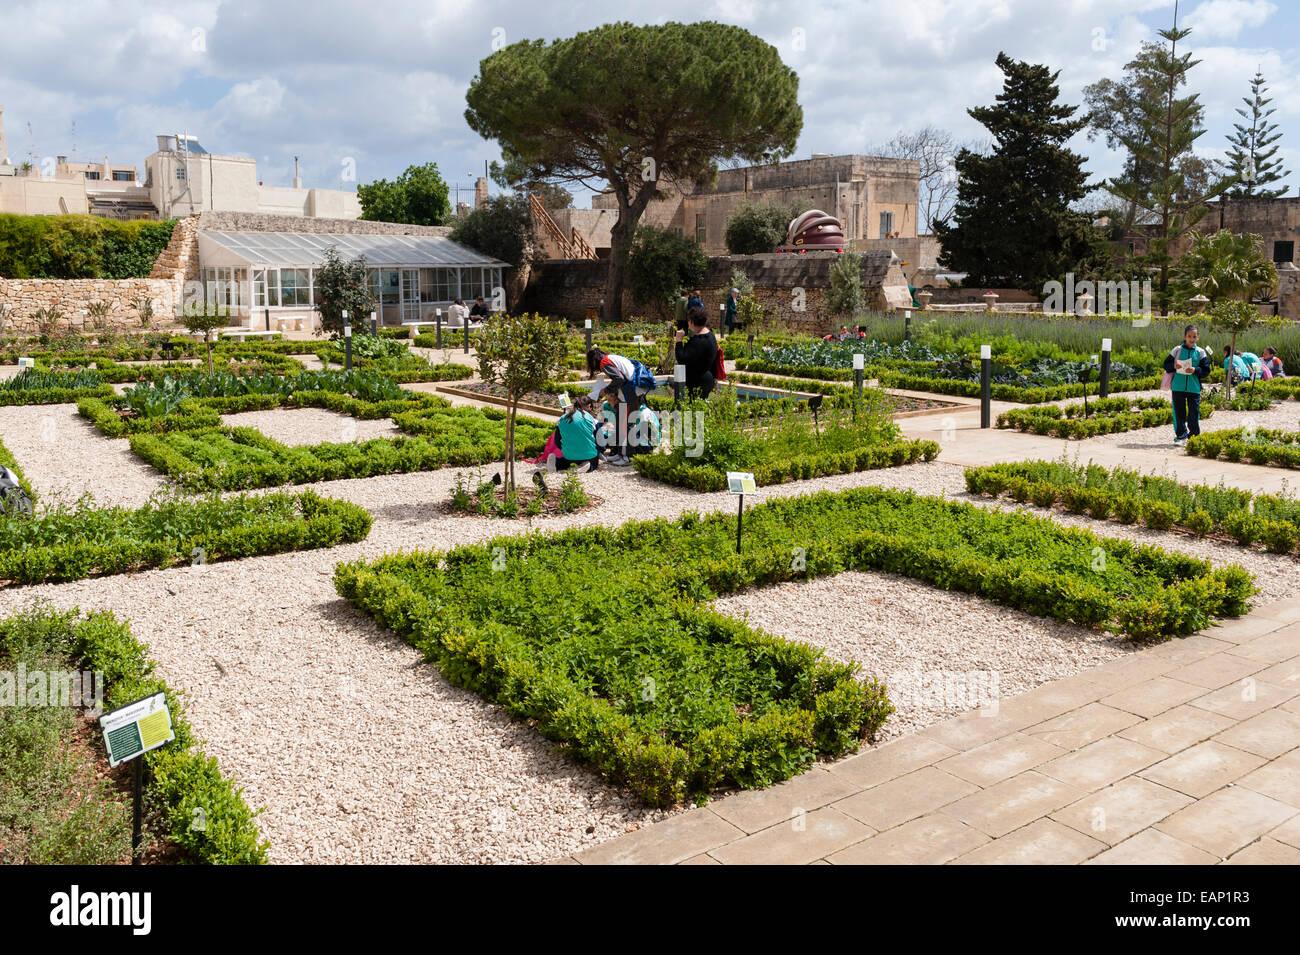 The President's Kitchen Garden, Attard, Malta. - Stock Image